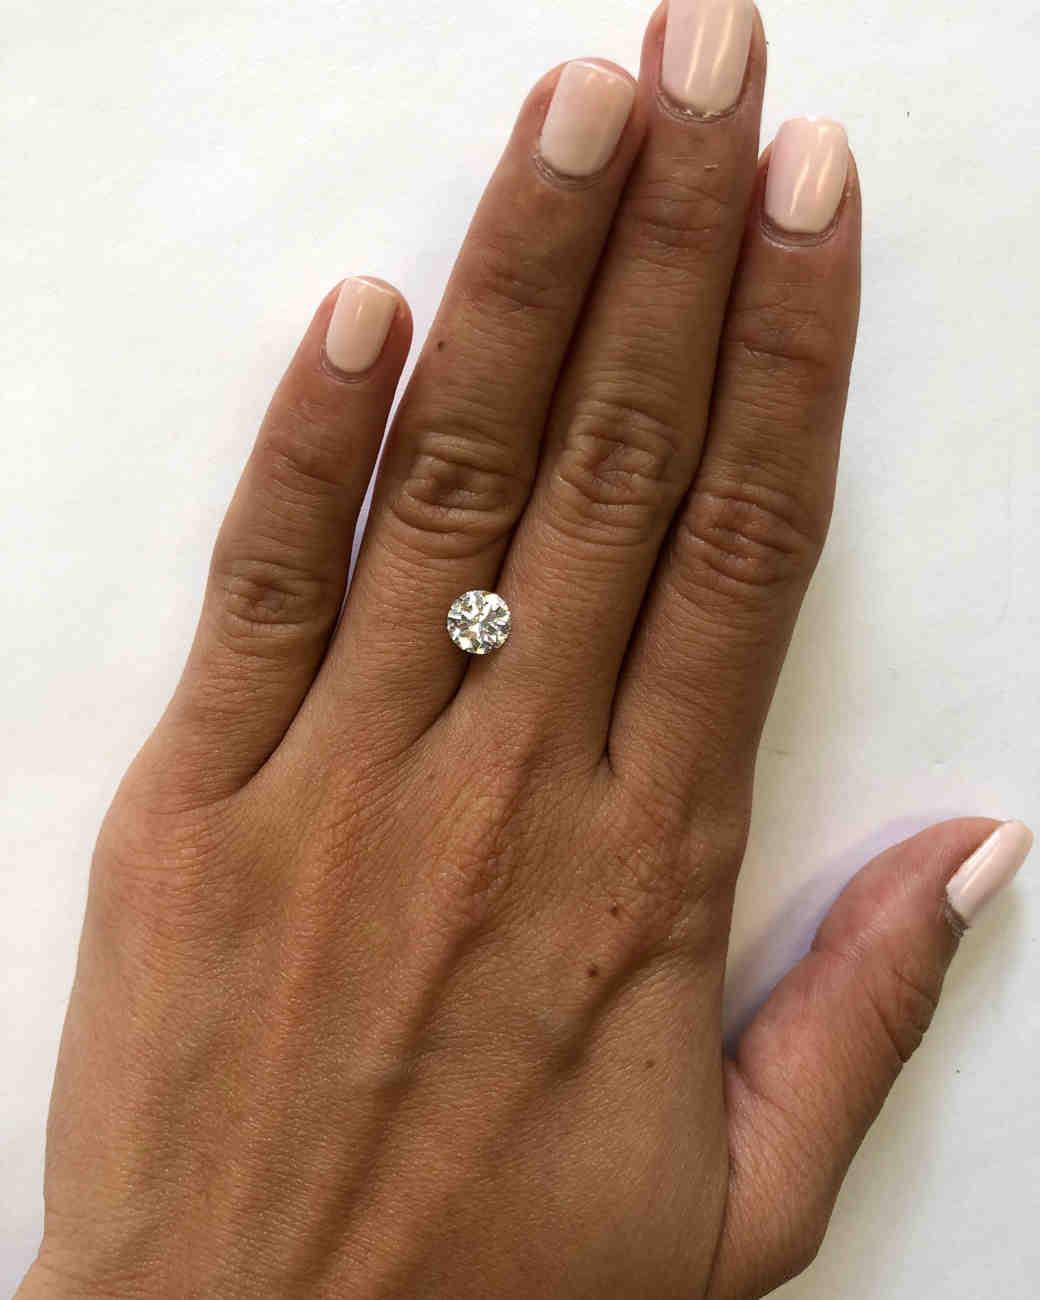 1carat Diamond: 1 Carat Diamond Ring At Websimilar.org